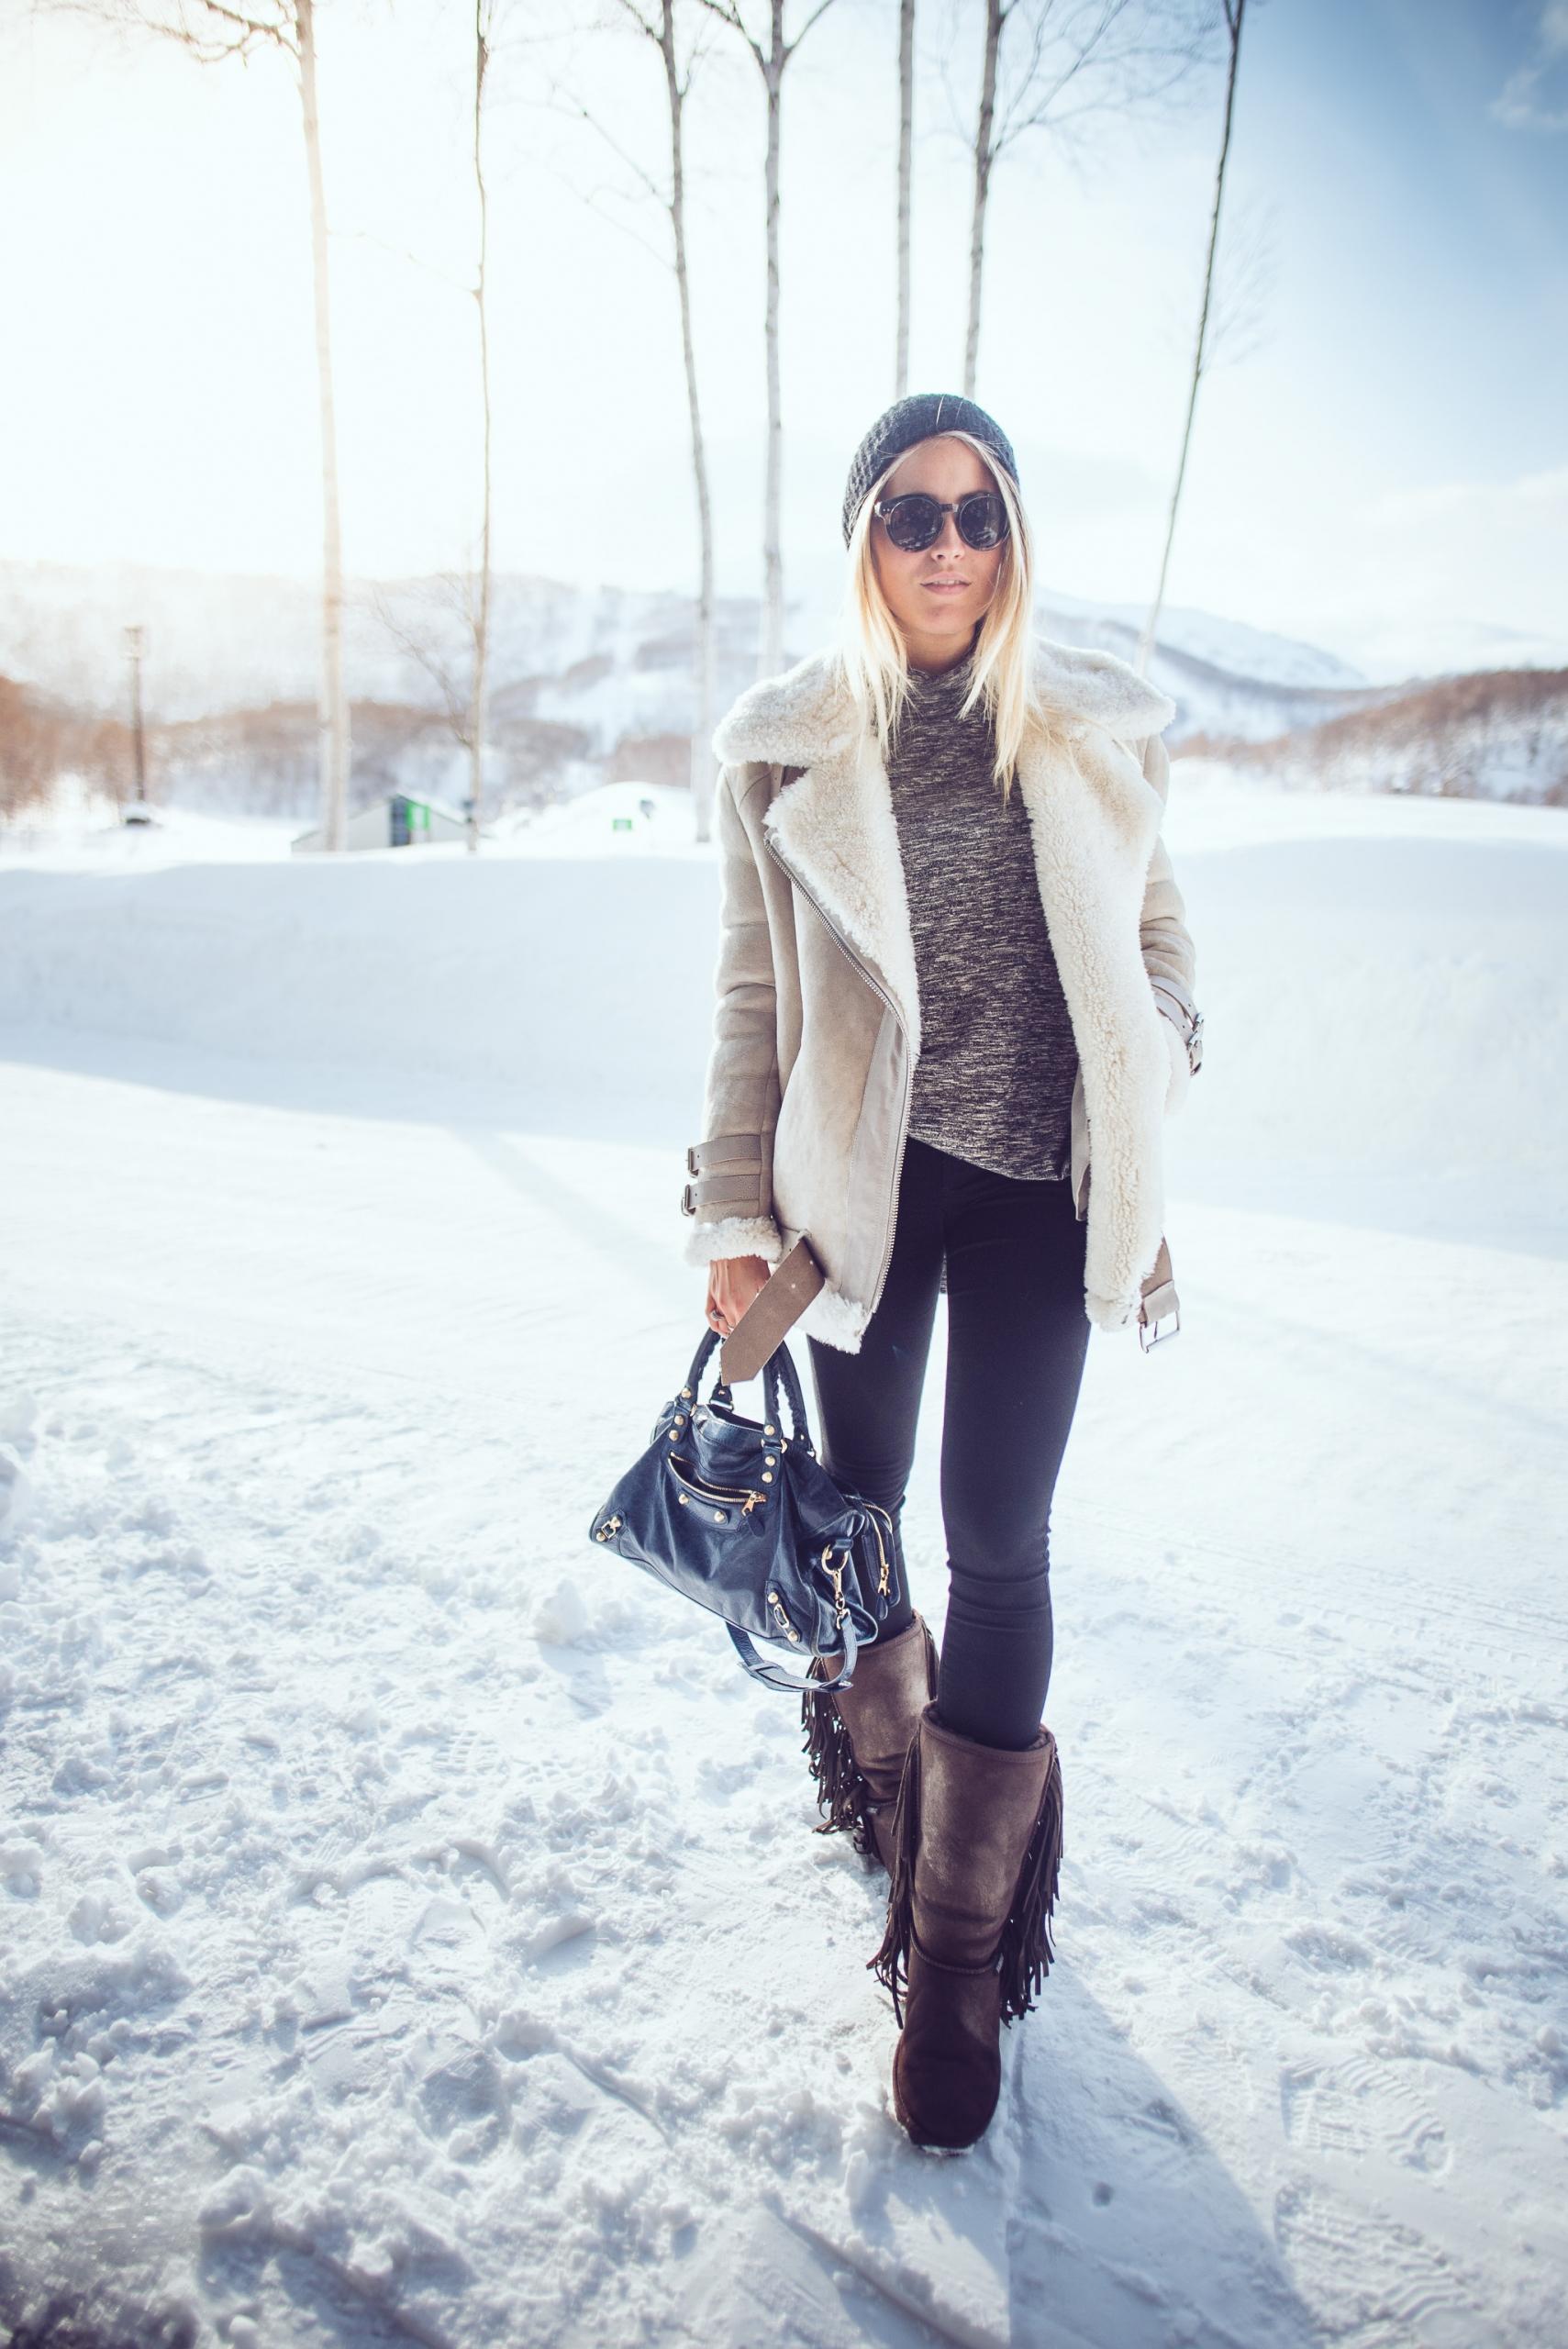 janni-deler-winter-outfitDSC_9629